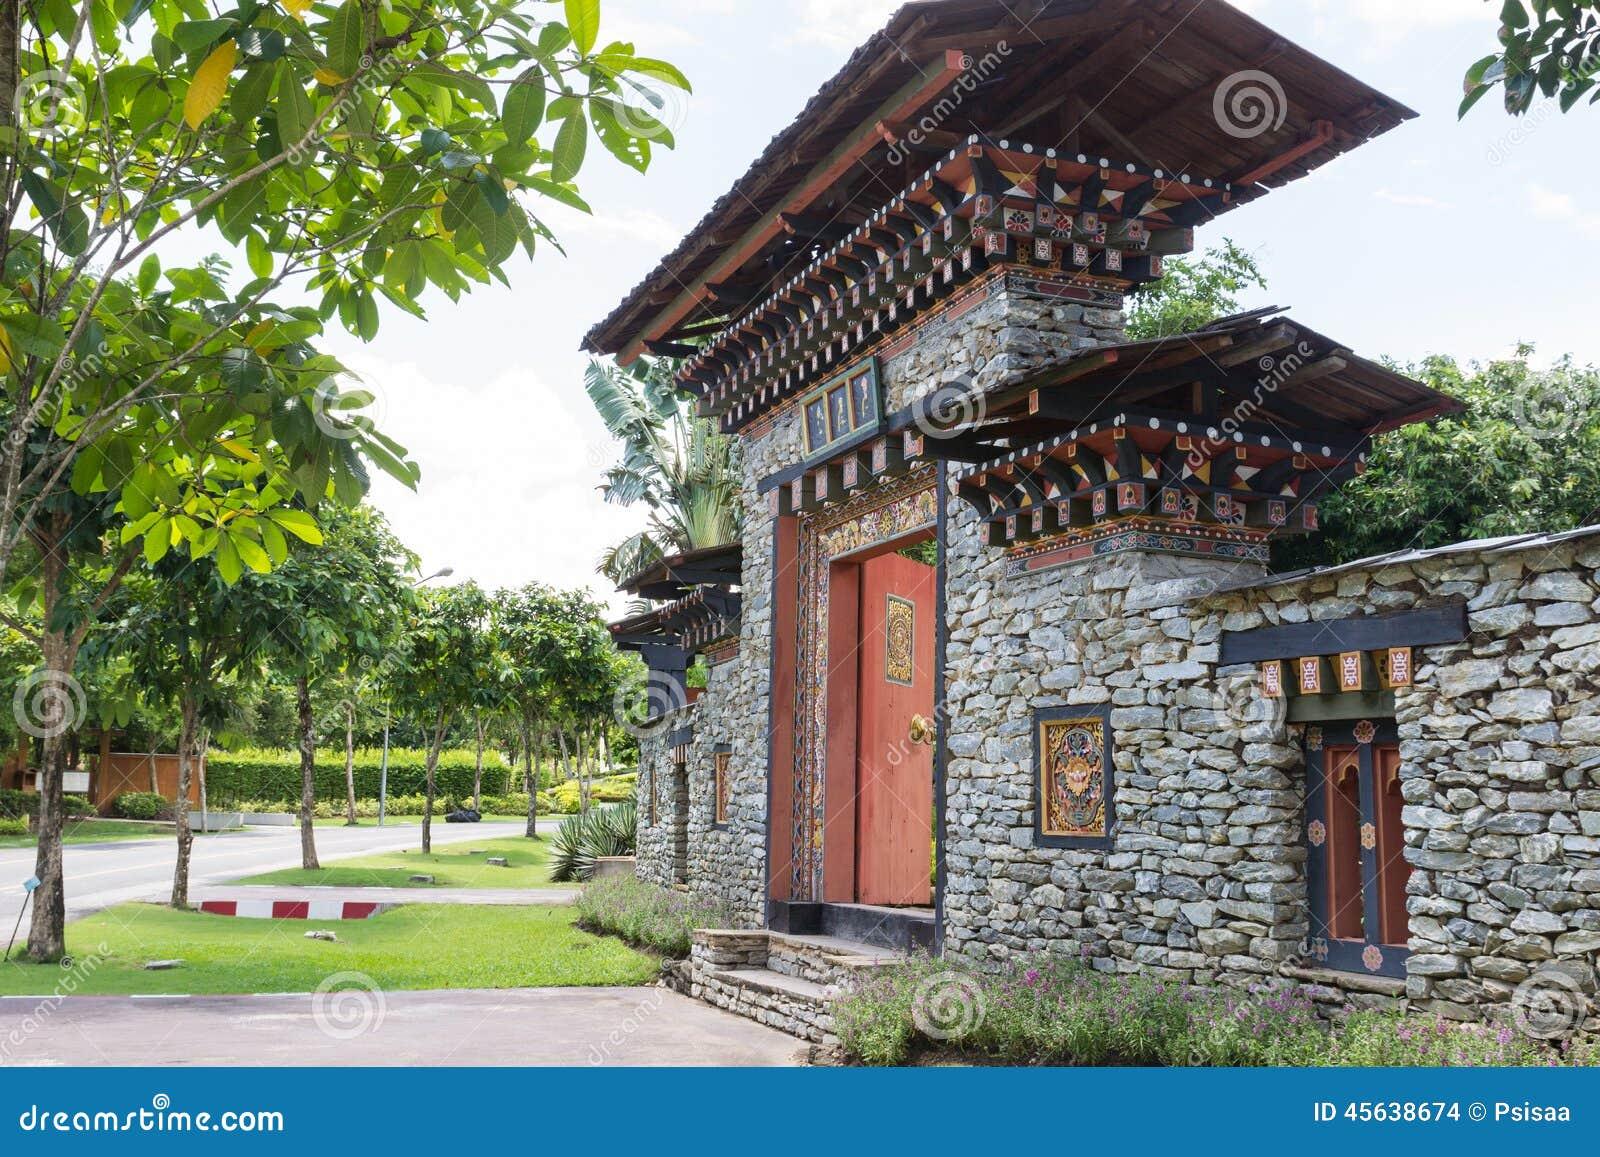 The design of bhutan gateway stock photo image 45638674 for Garden gateway